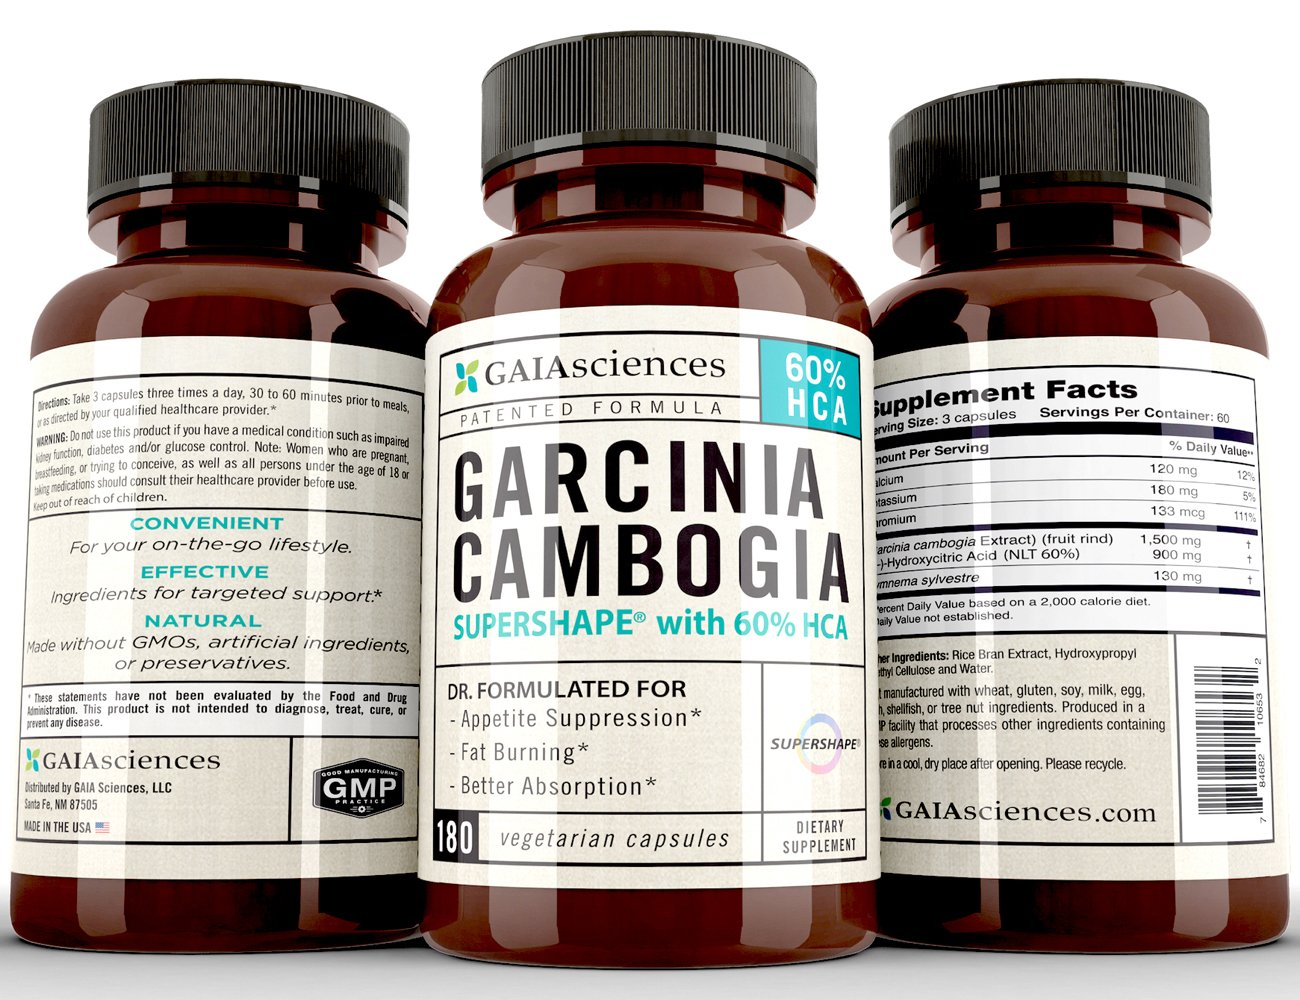 Gaia Sciences Garcinia Cambogia Super CitriMaxつ Scientifically Proven Patented Formula for Appetite Suppression & Fat Metabolism by GAIAsciences B00RZTK0Q8